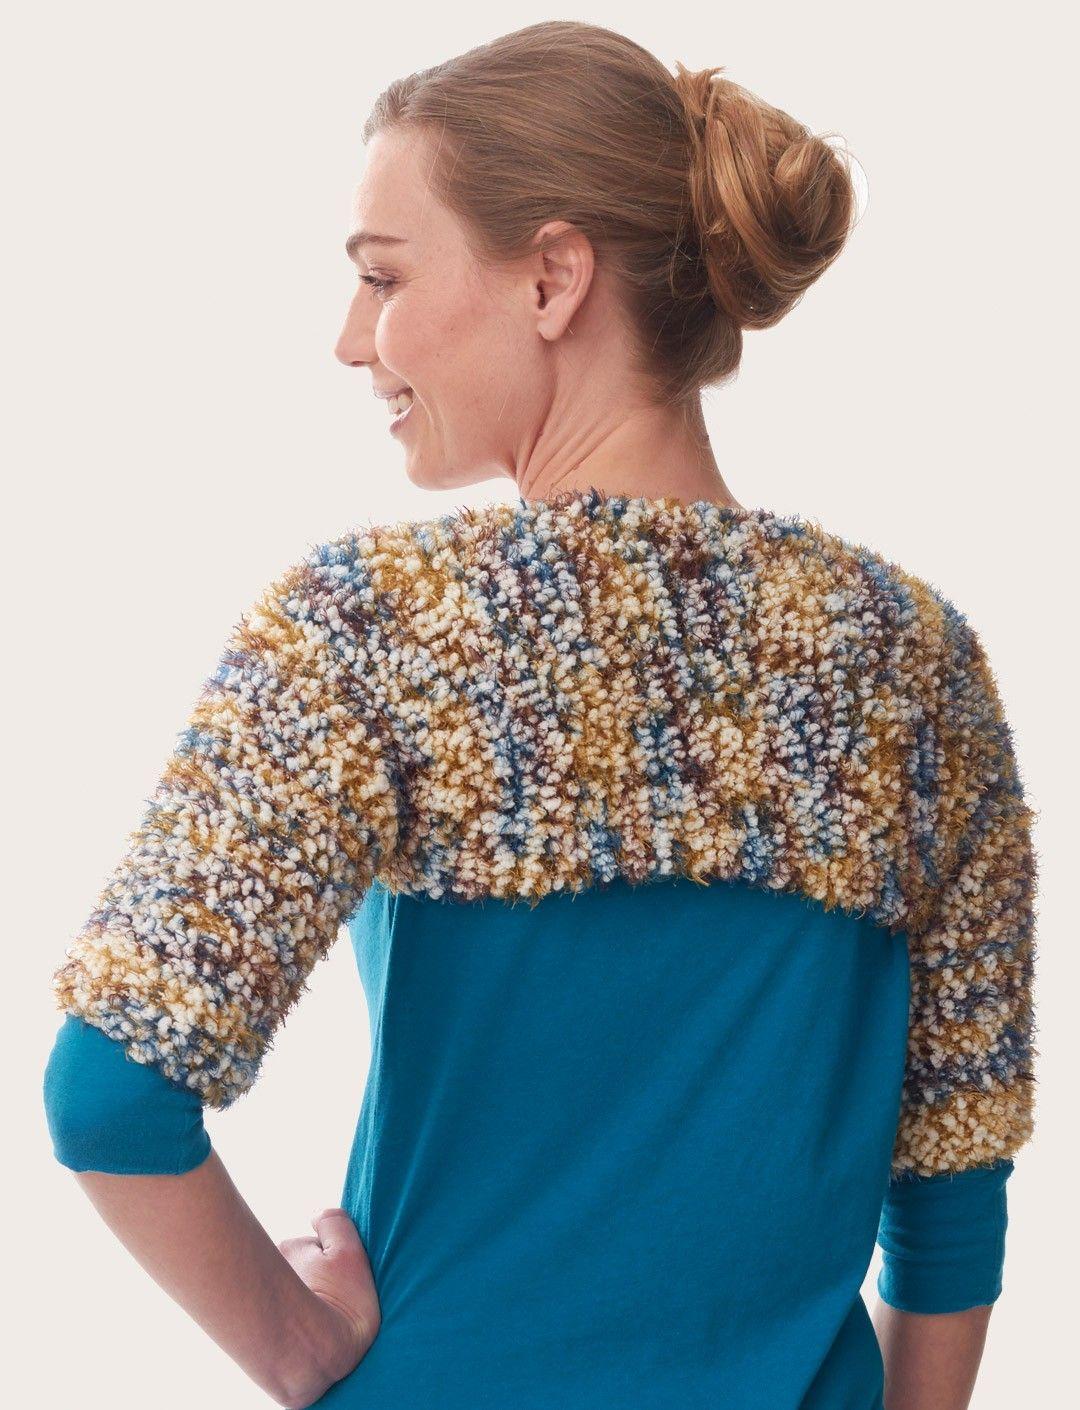 Yarnspirations bernat blissful shrug patterns knitting patterns bankloansurffo Image collections